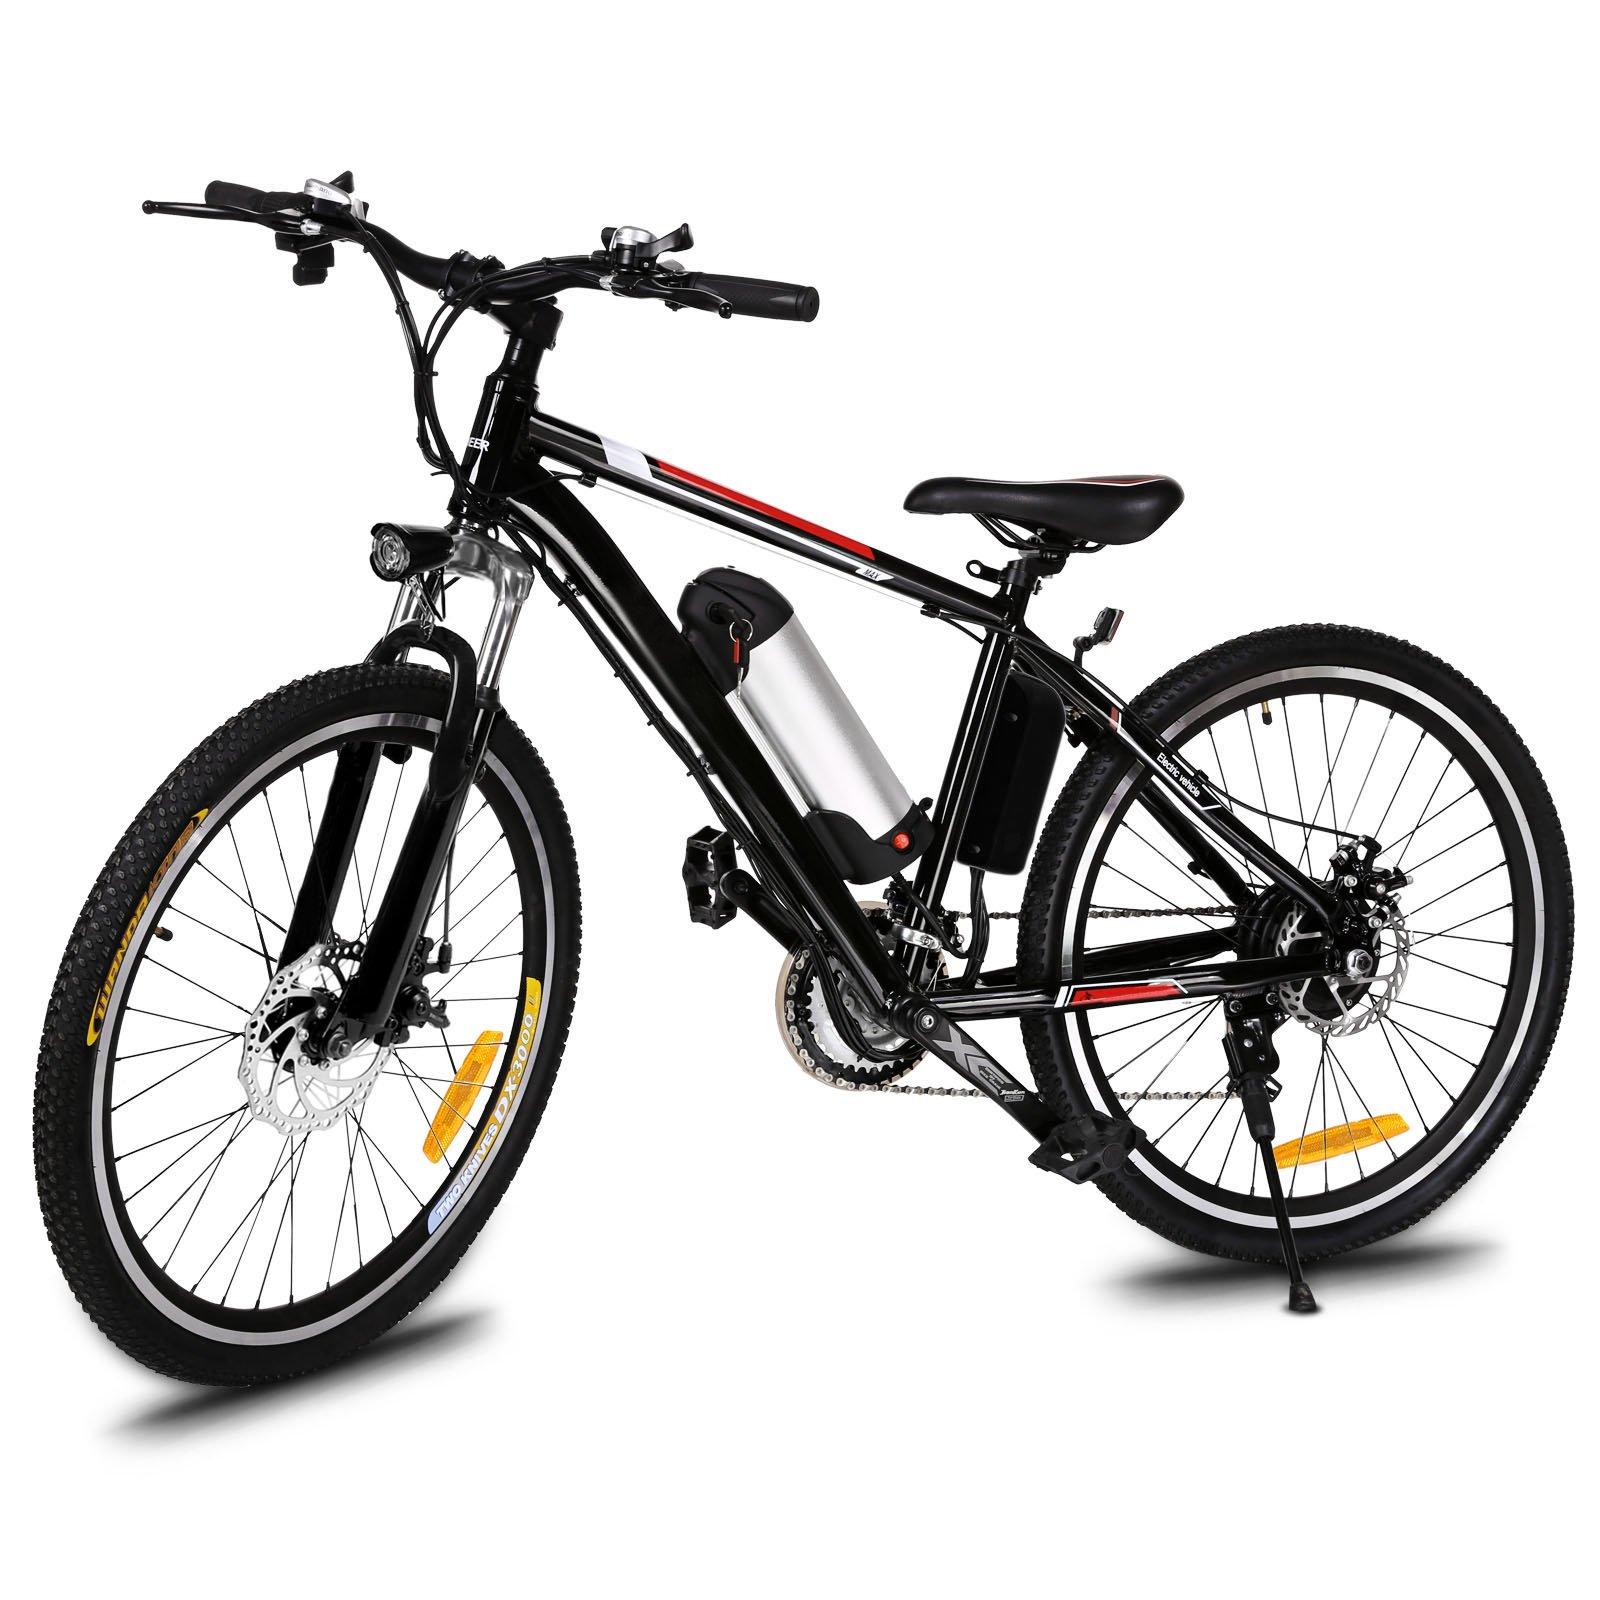 Yiilove Electric Mountain Bike 26   Wheel Ebike 36V Lithium-Ion Battery cbf70c135